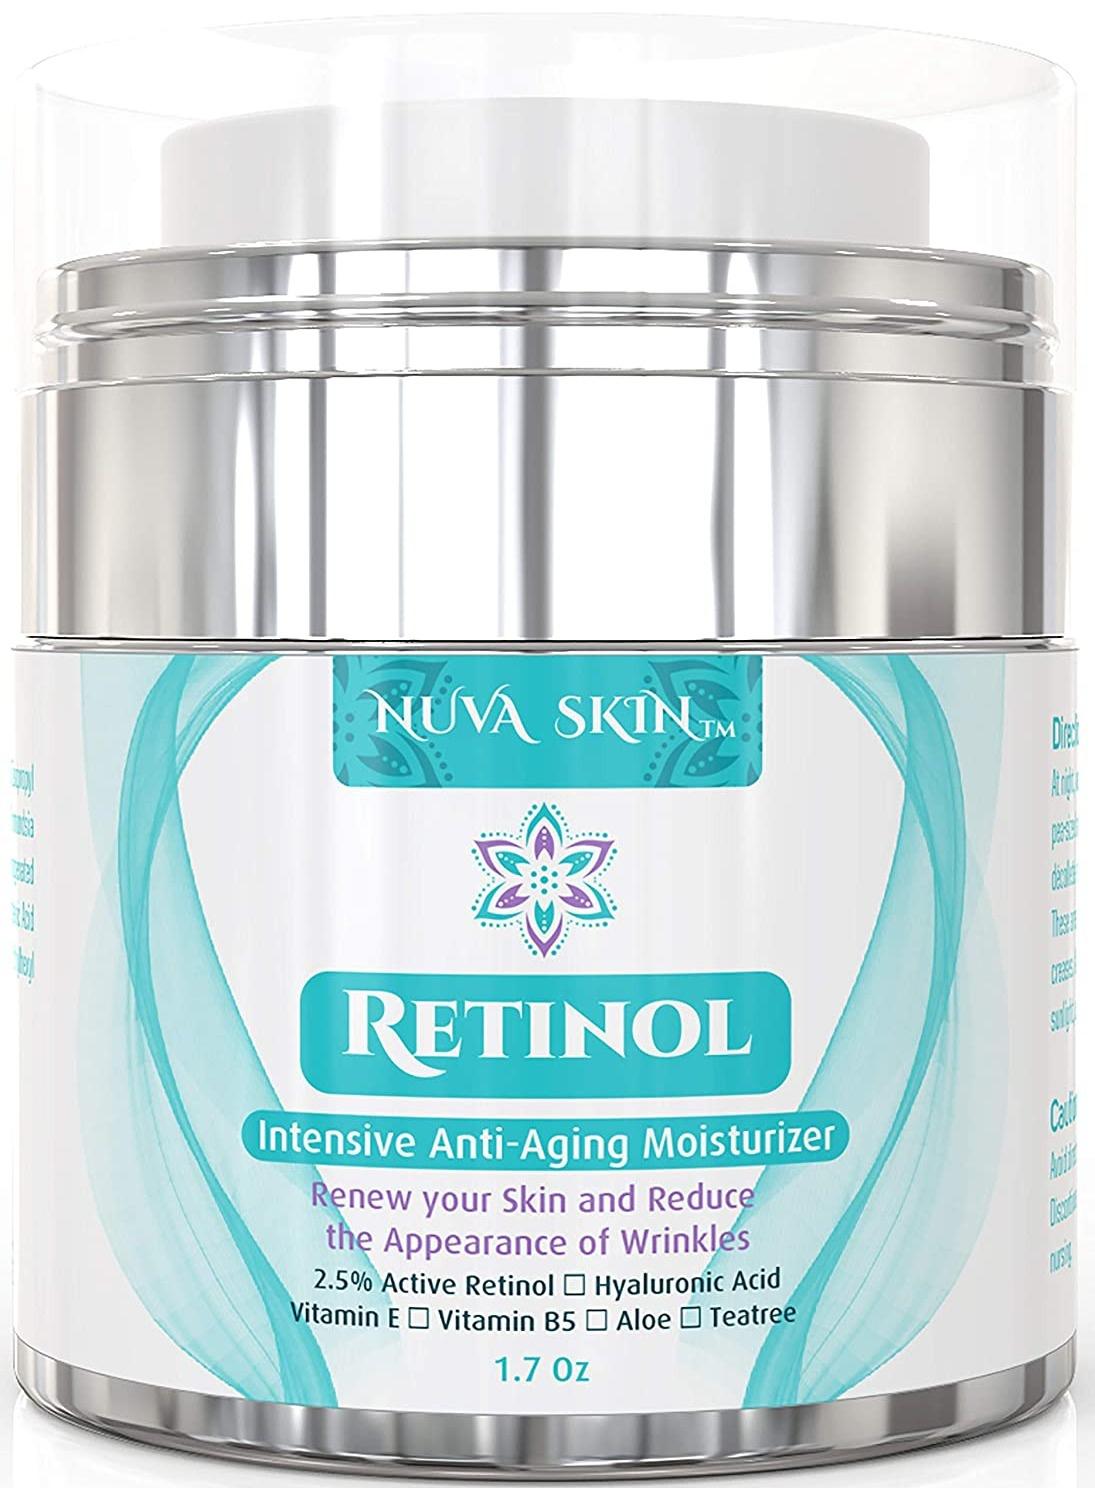 Nuva Skin Retinol Intensive Anti-Aging Moisturizer